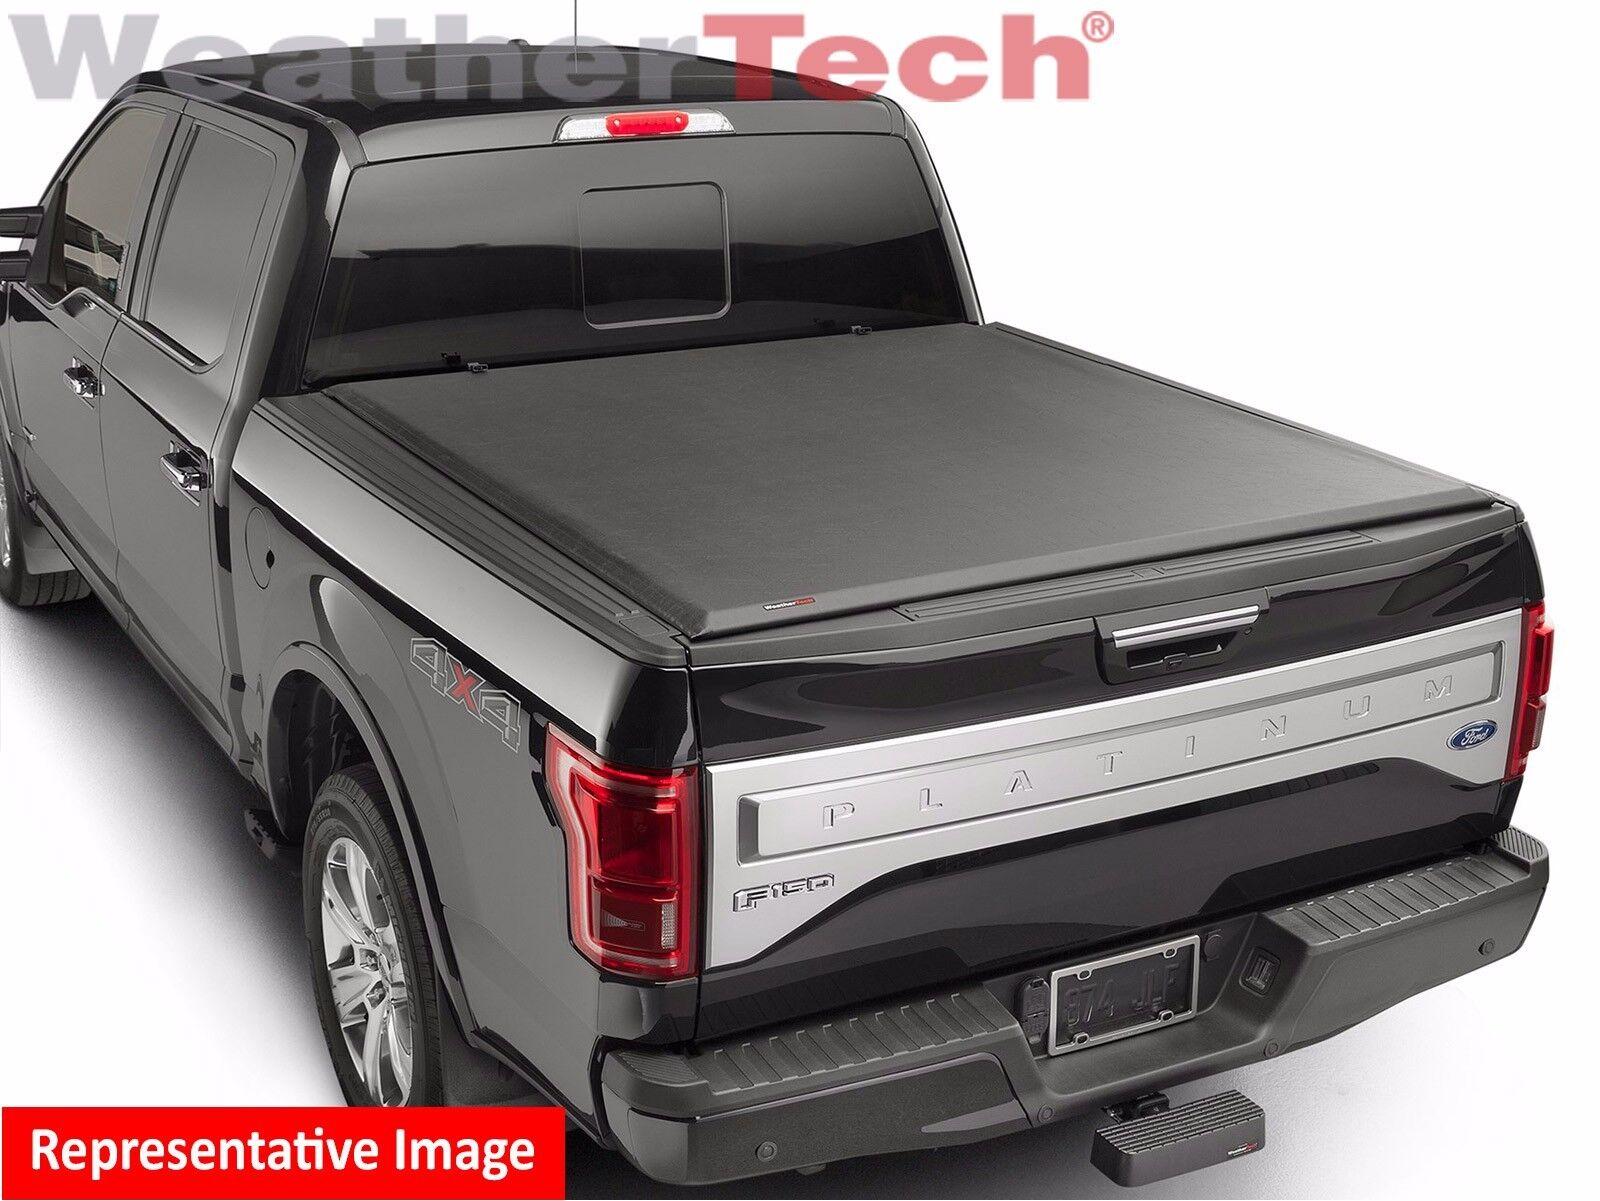 Weathertech Roll Up Truck Bed Cover For Honda Ridgeline 2017 2019 Ebay